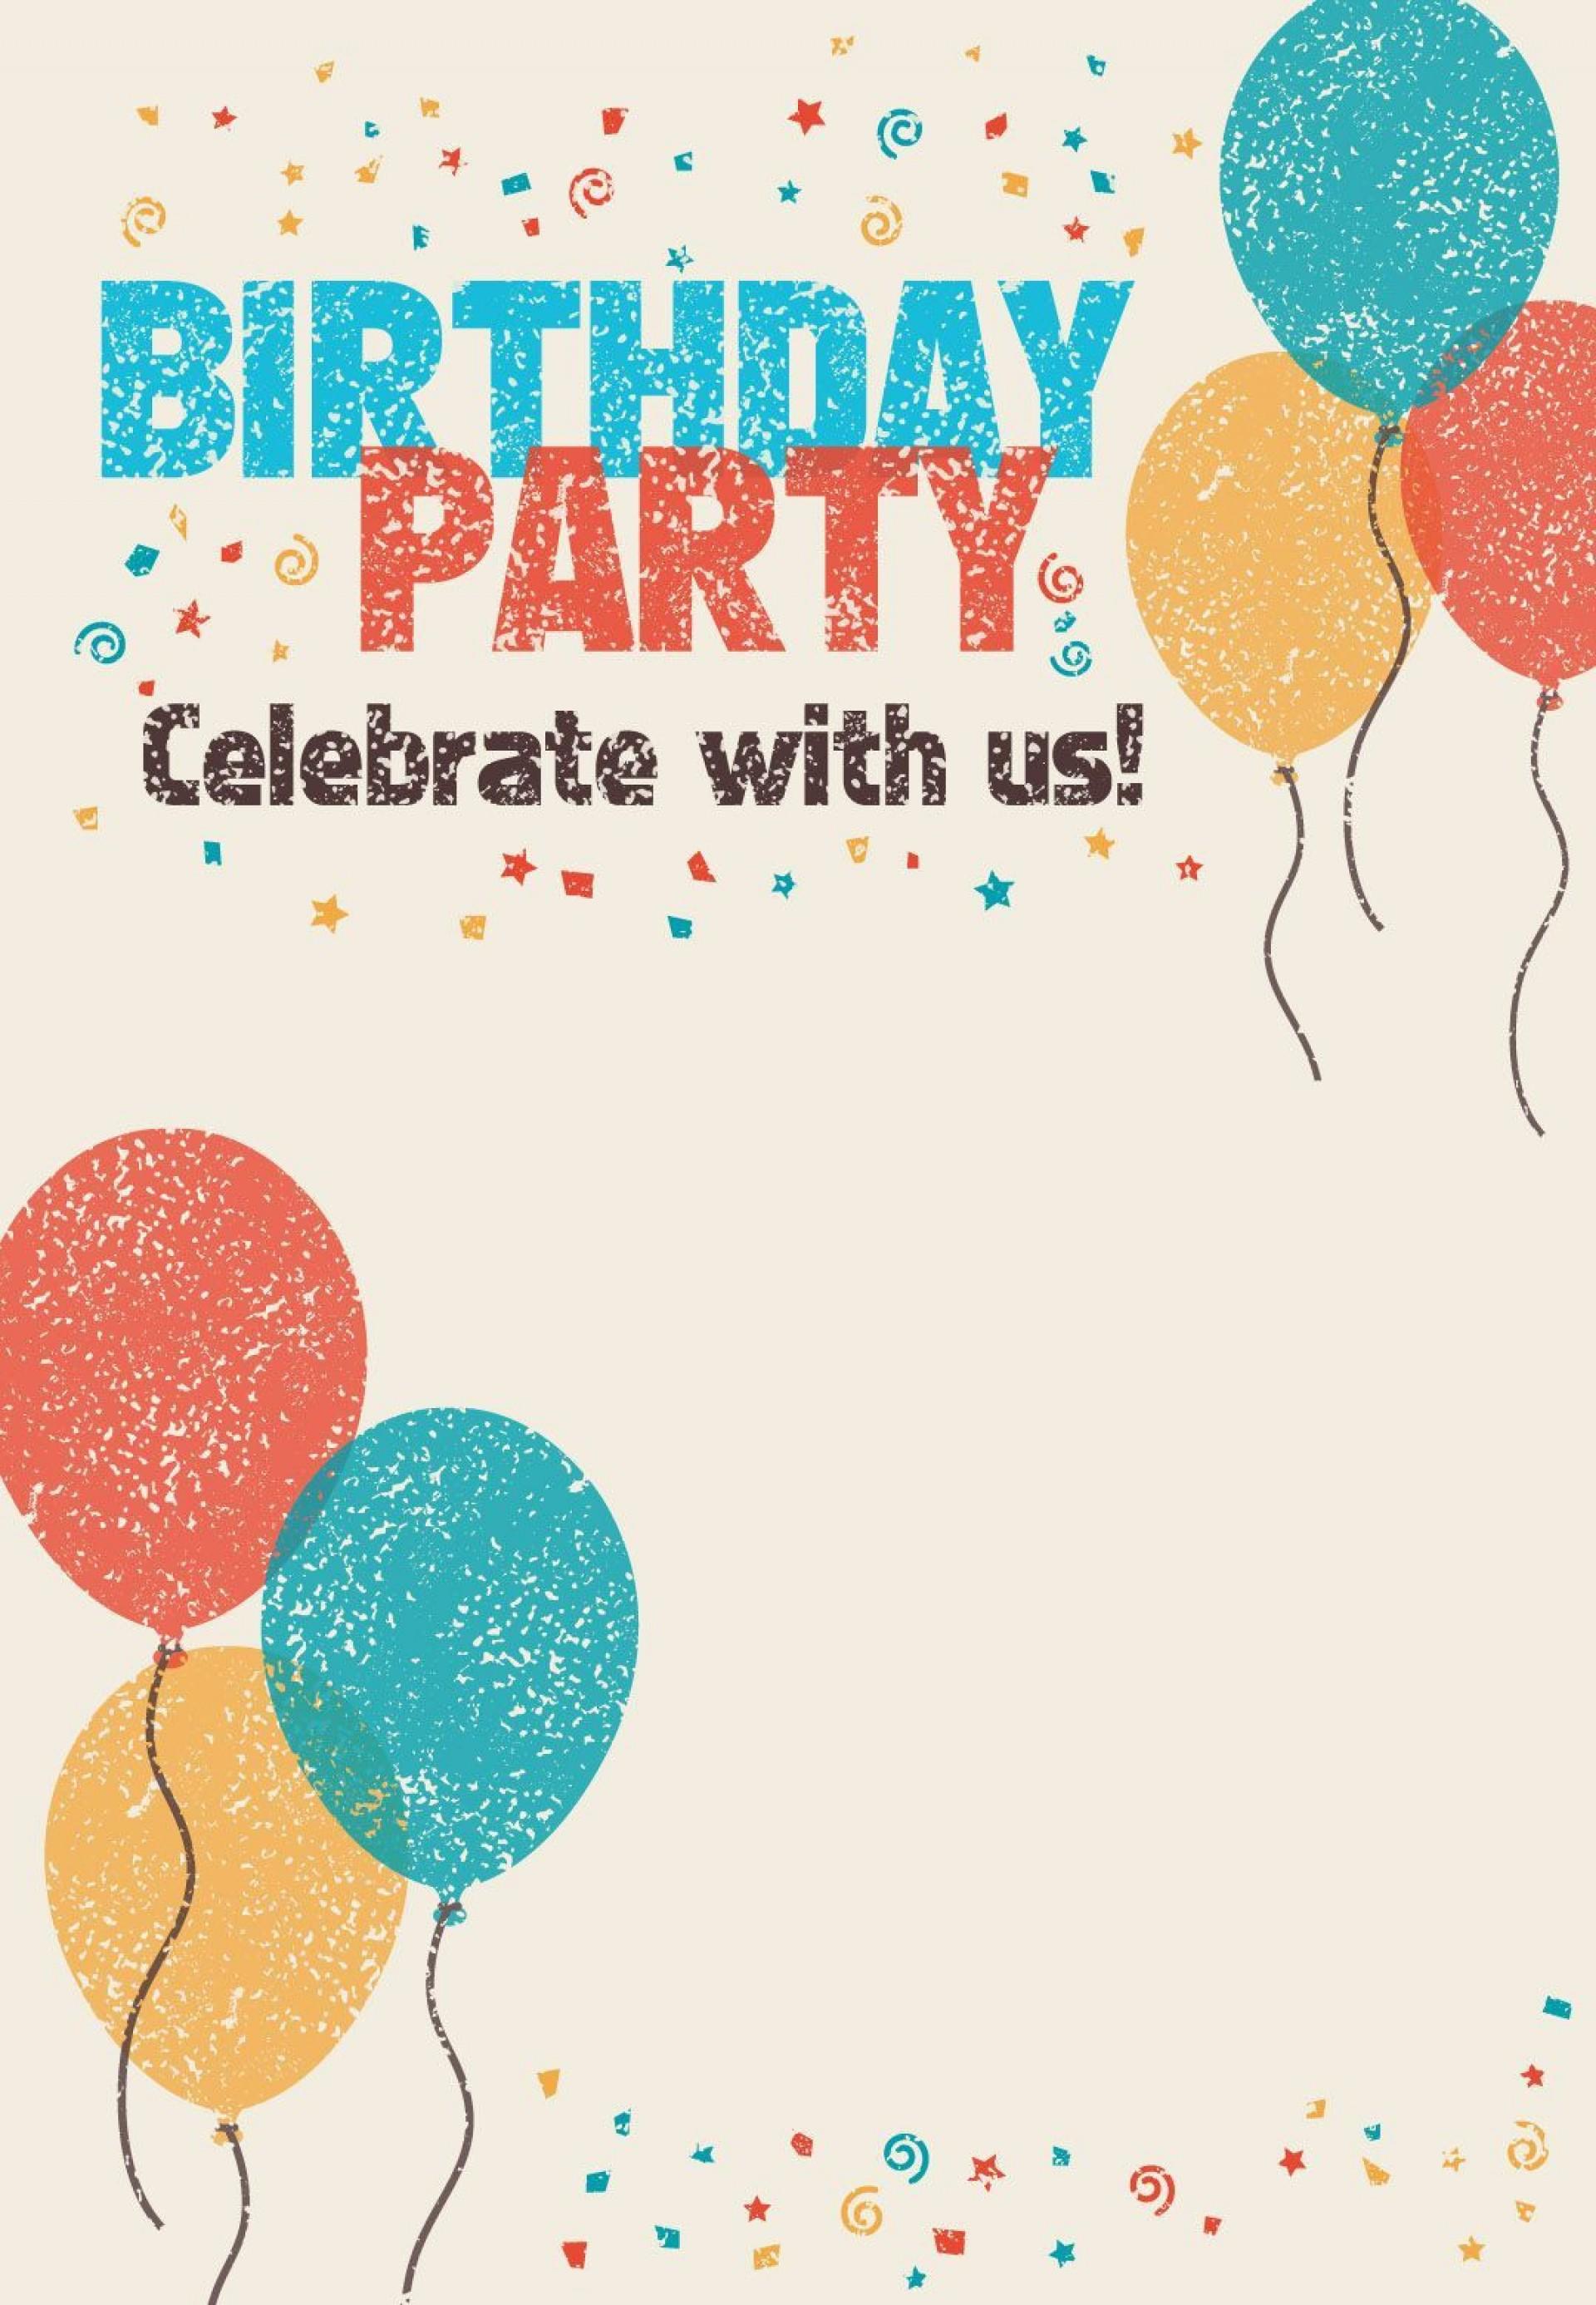 002 Excellent Free Birthday Party Invitation Template Design  Templates Printable 16th Australia Uk1920